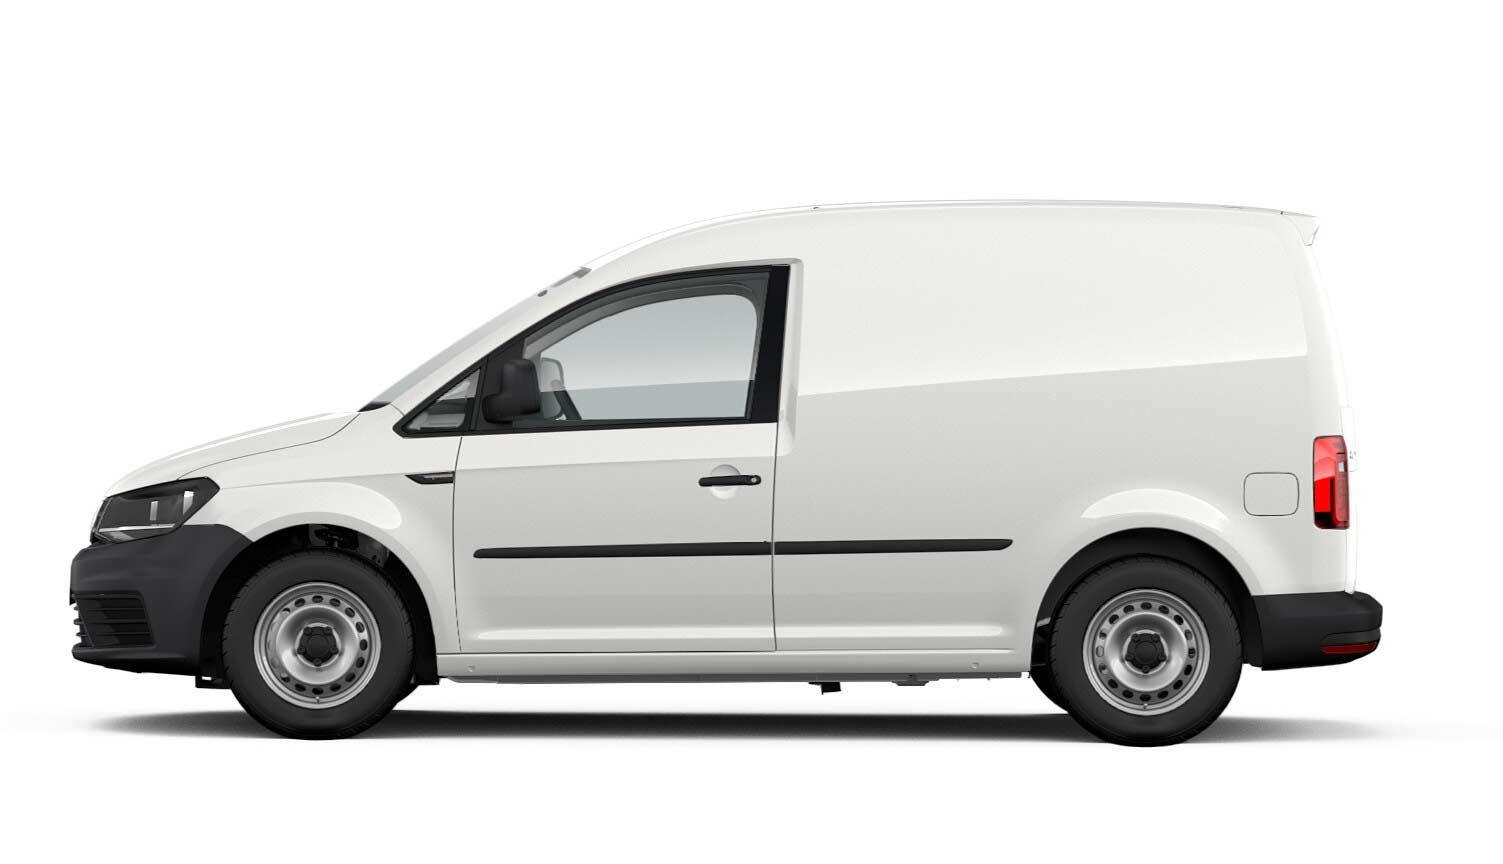 "Caddy Kastenwagen ""EcoProfi"" Motor: 1,0 l TSI EU6 BlueMotion Technology 75 kW Getriebe: 5-Gang-Schaltgetriebe Radstand: 2681 mm"